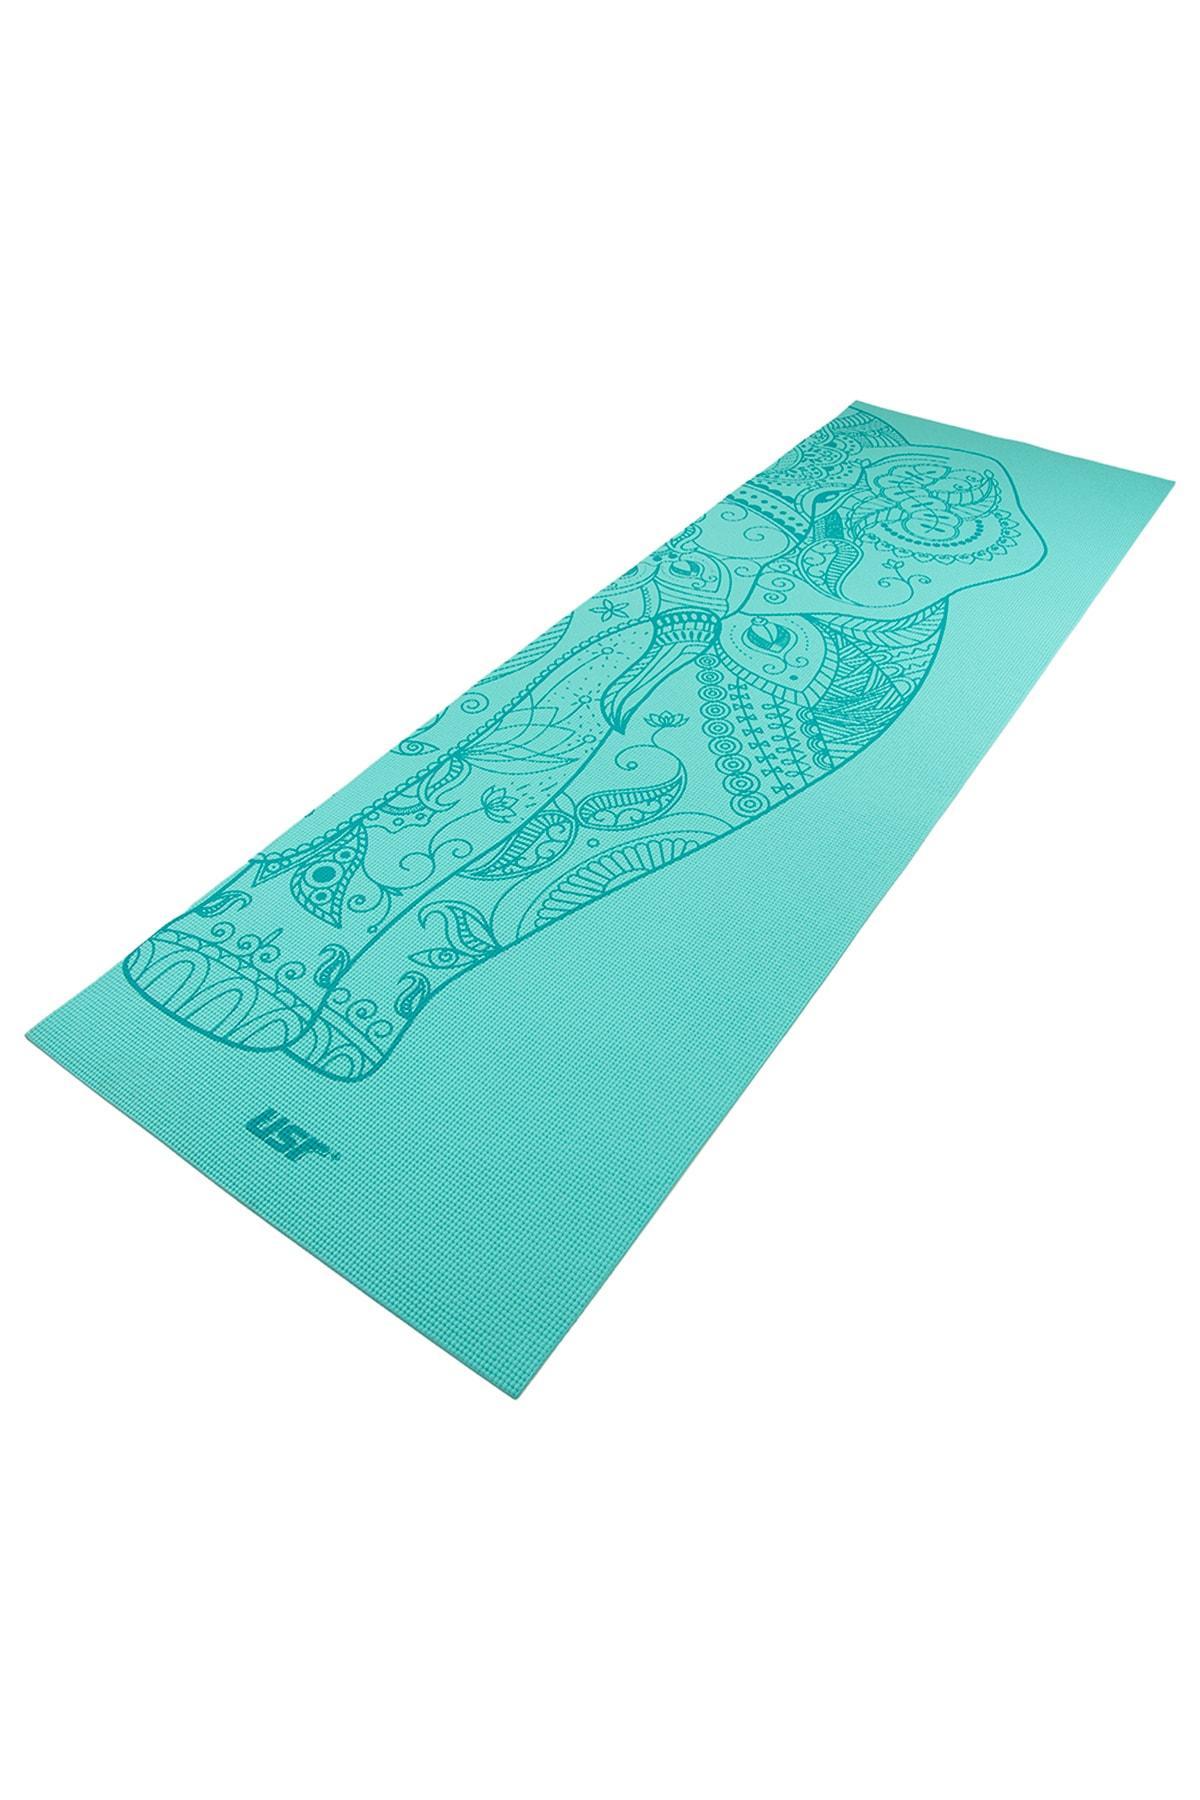 USR Royal Yoga Mat 1